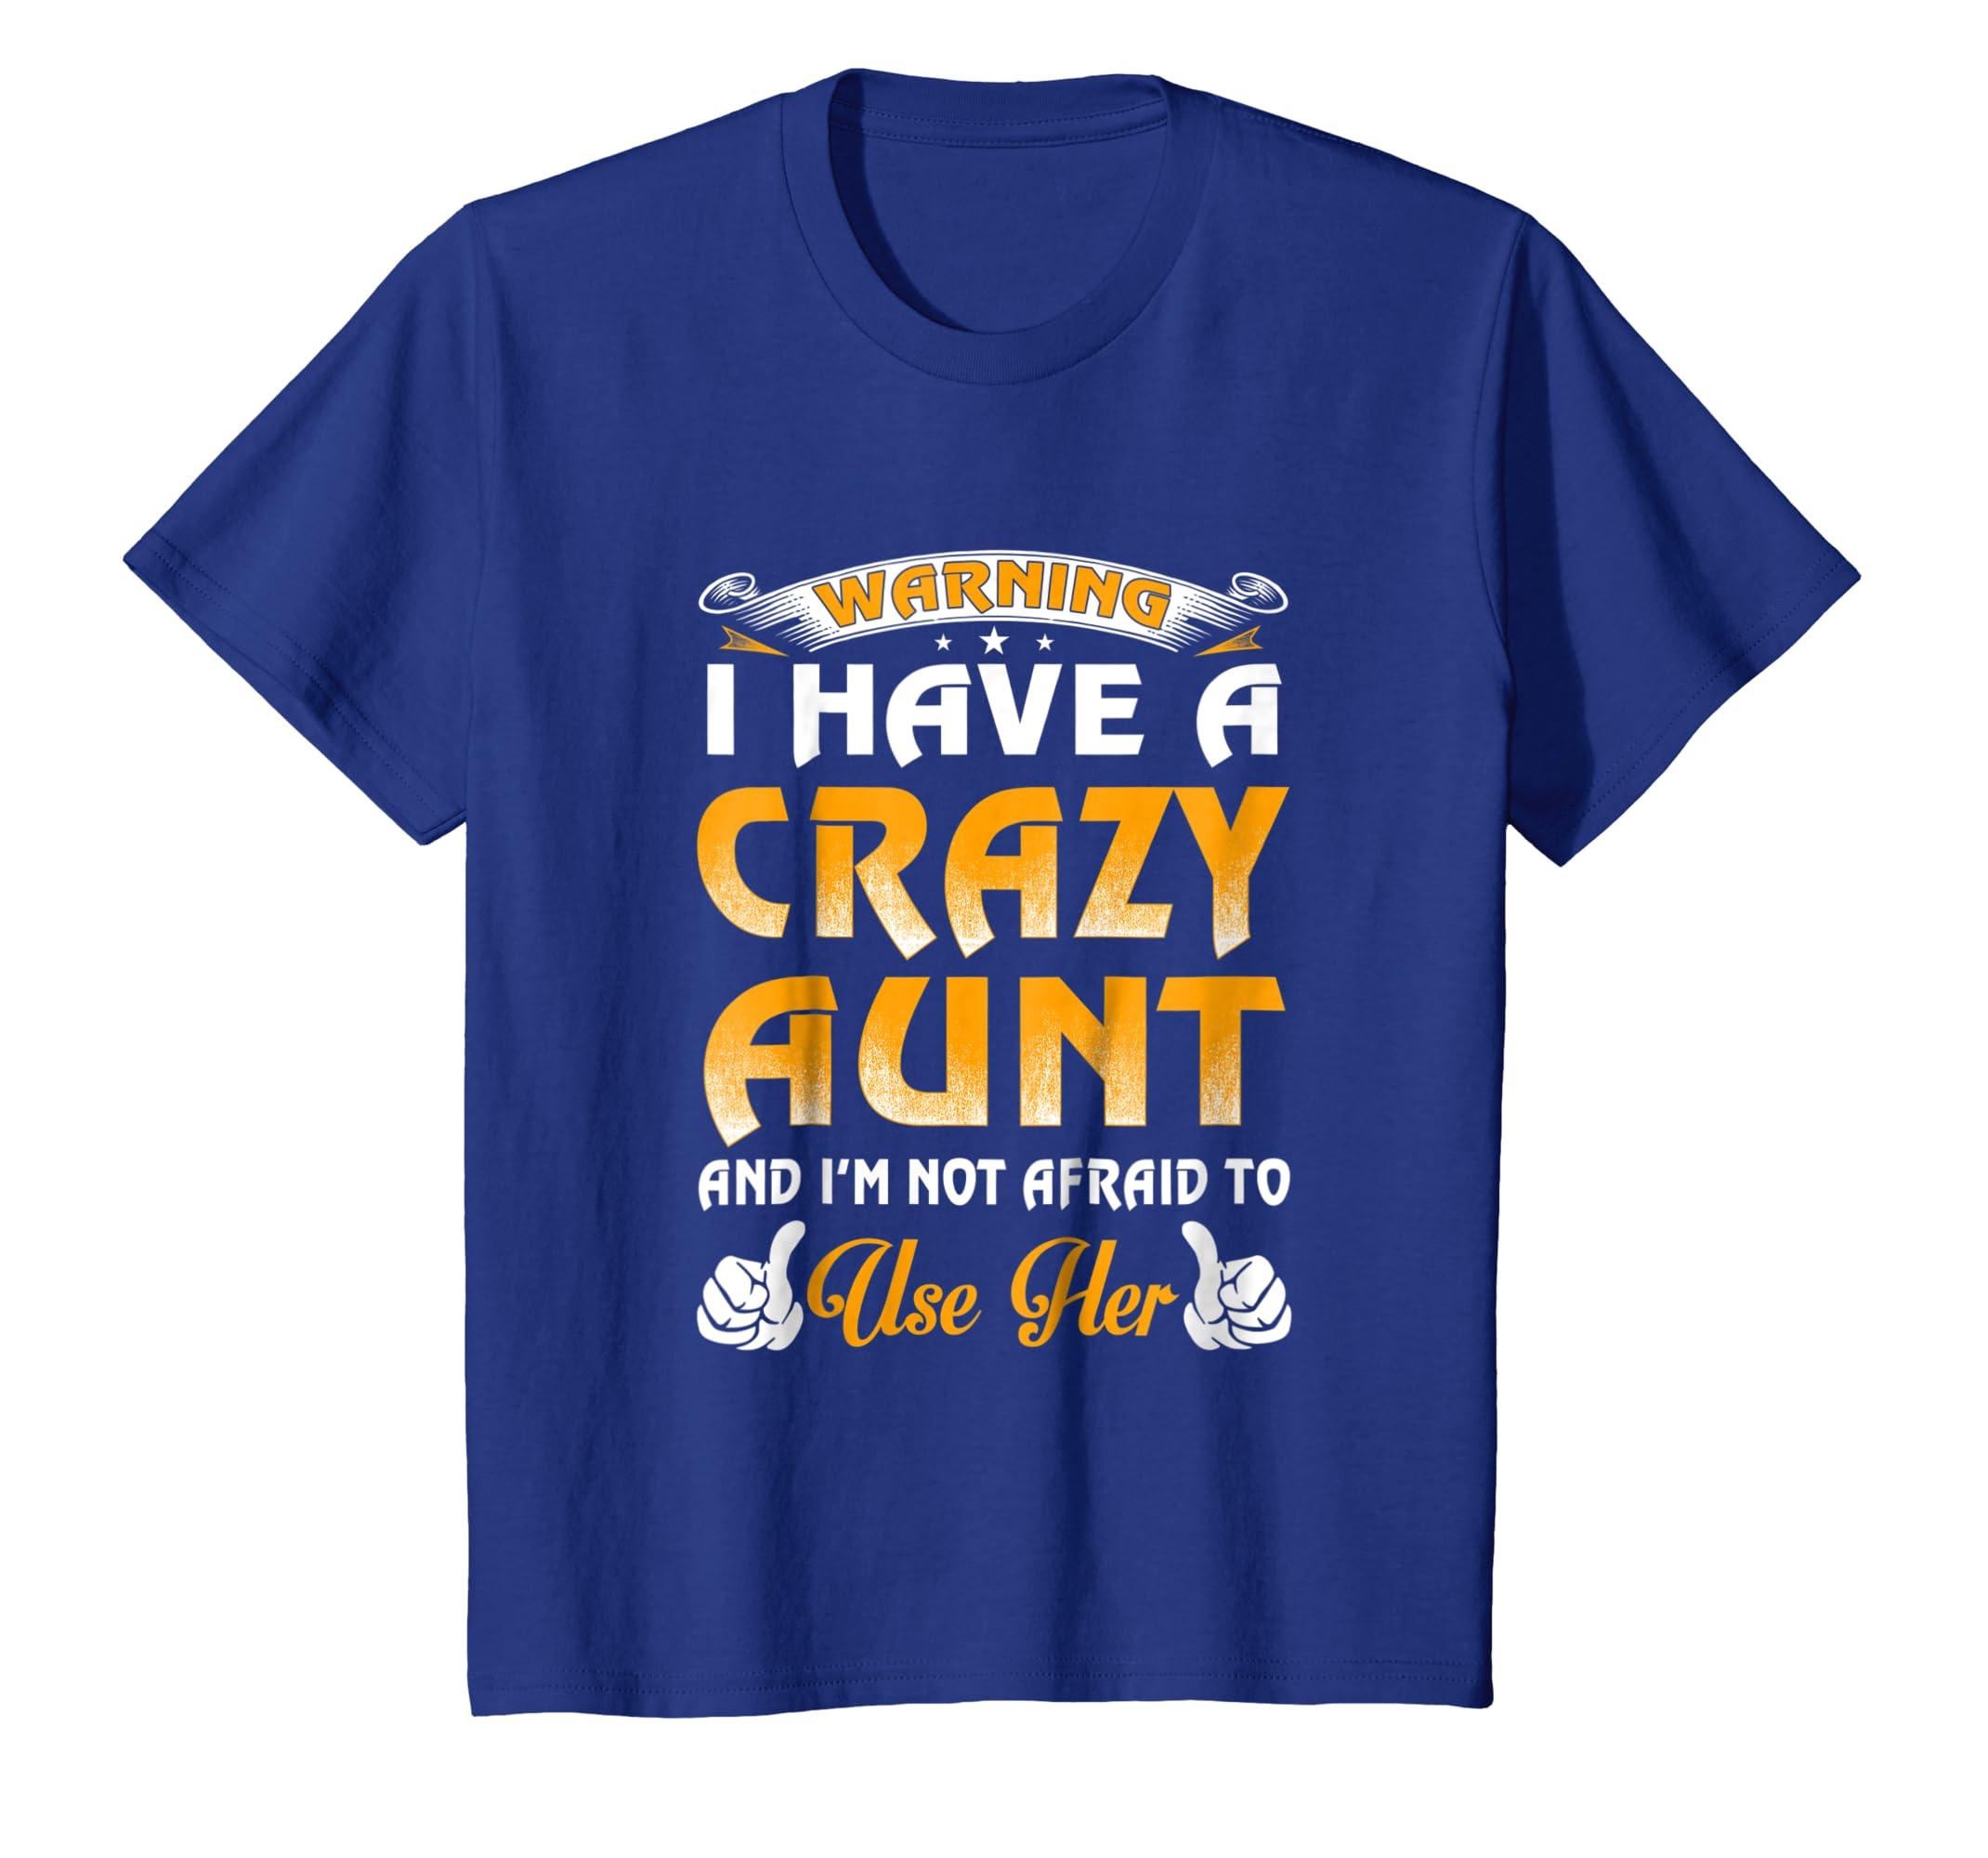 b1ebd1cbf95c Amazon.com  Warning I Have A Crazy Aunt Shirt  Clothing